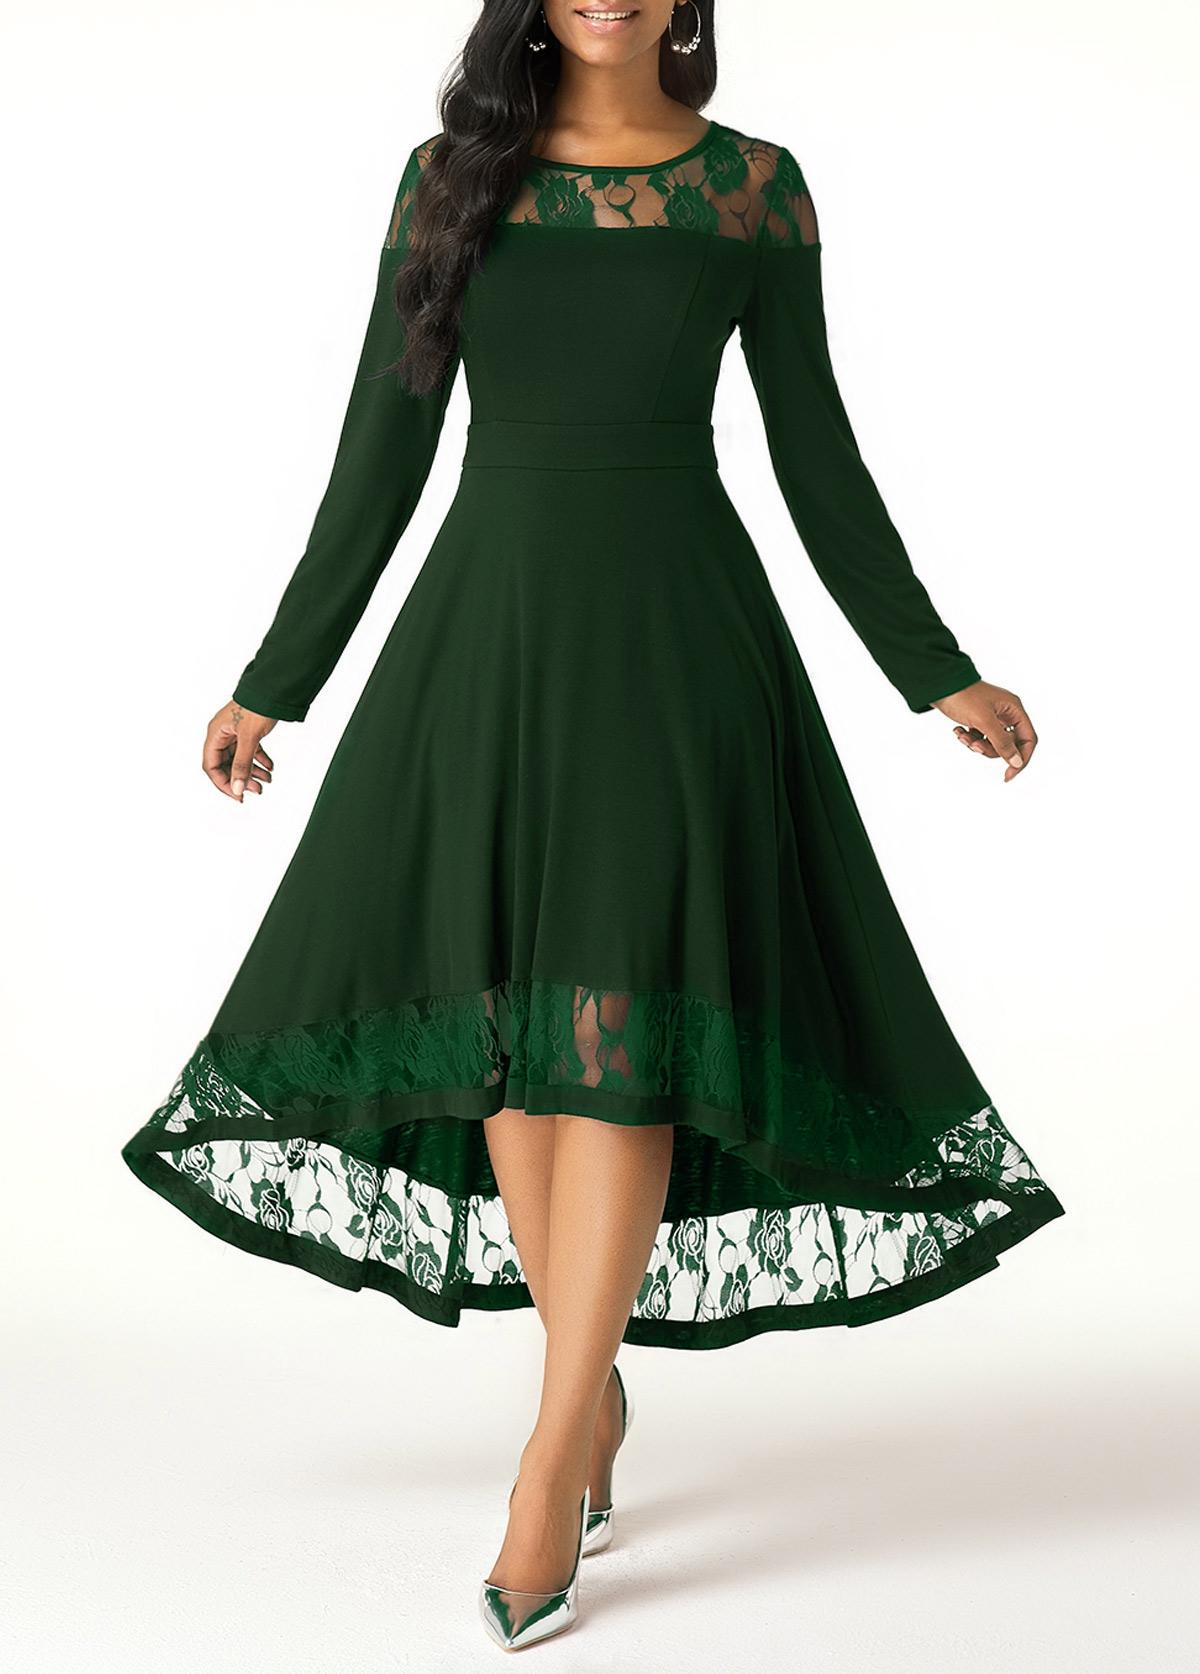 ROTITA Lace Panel Green Long Sleeve High Low Dress